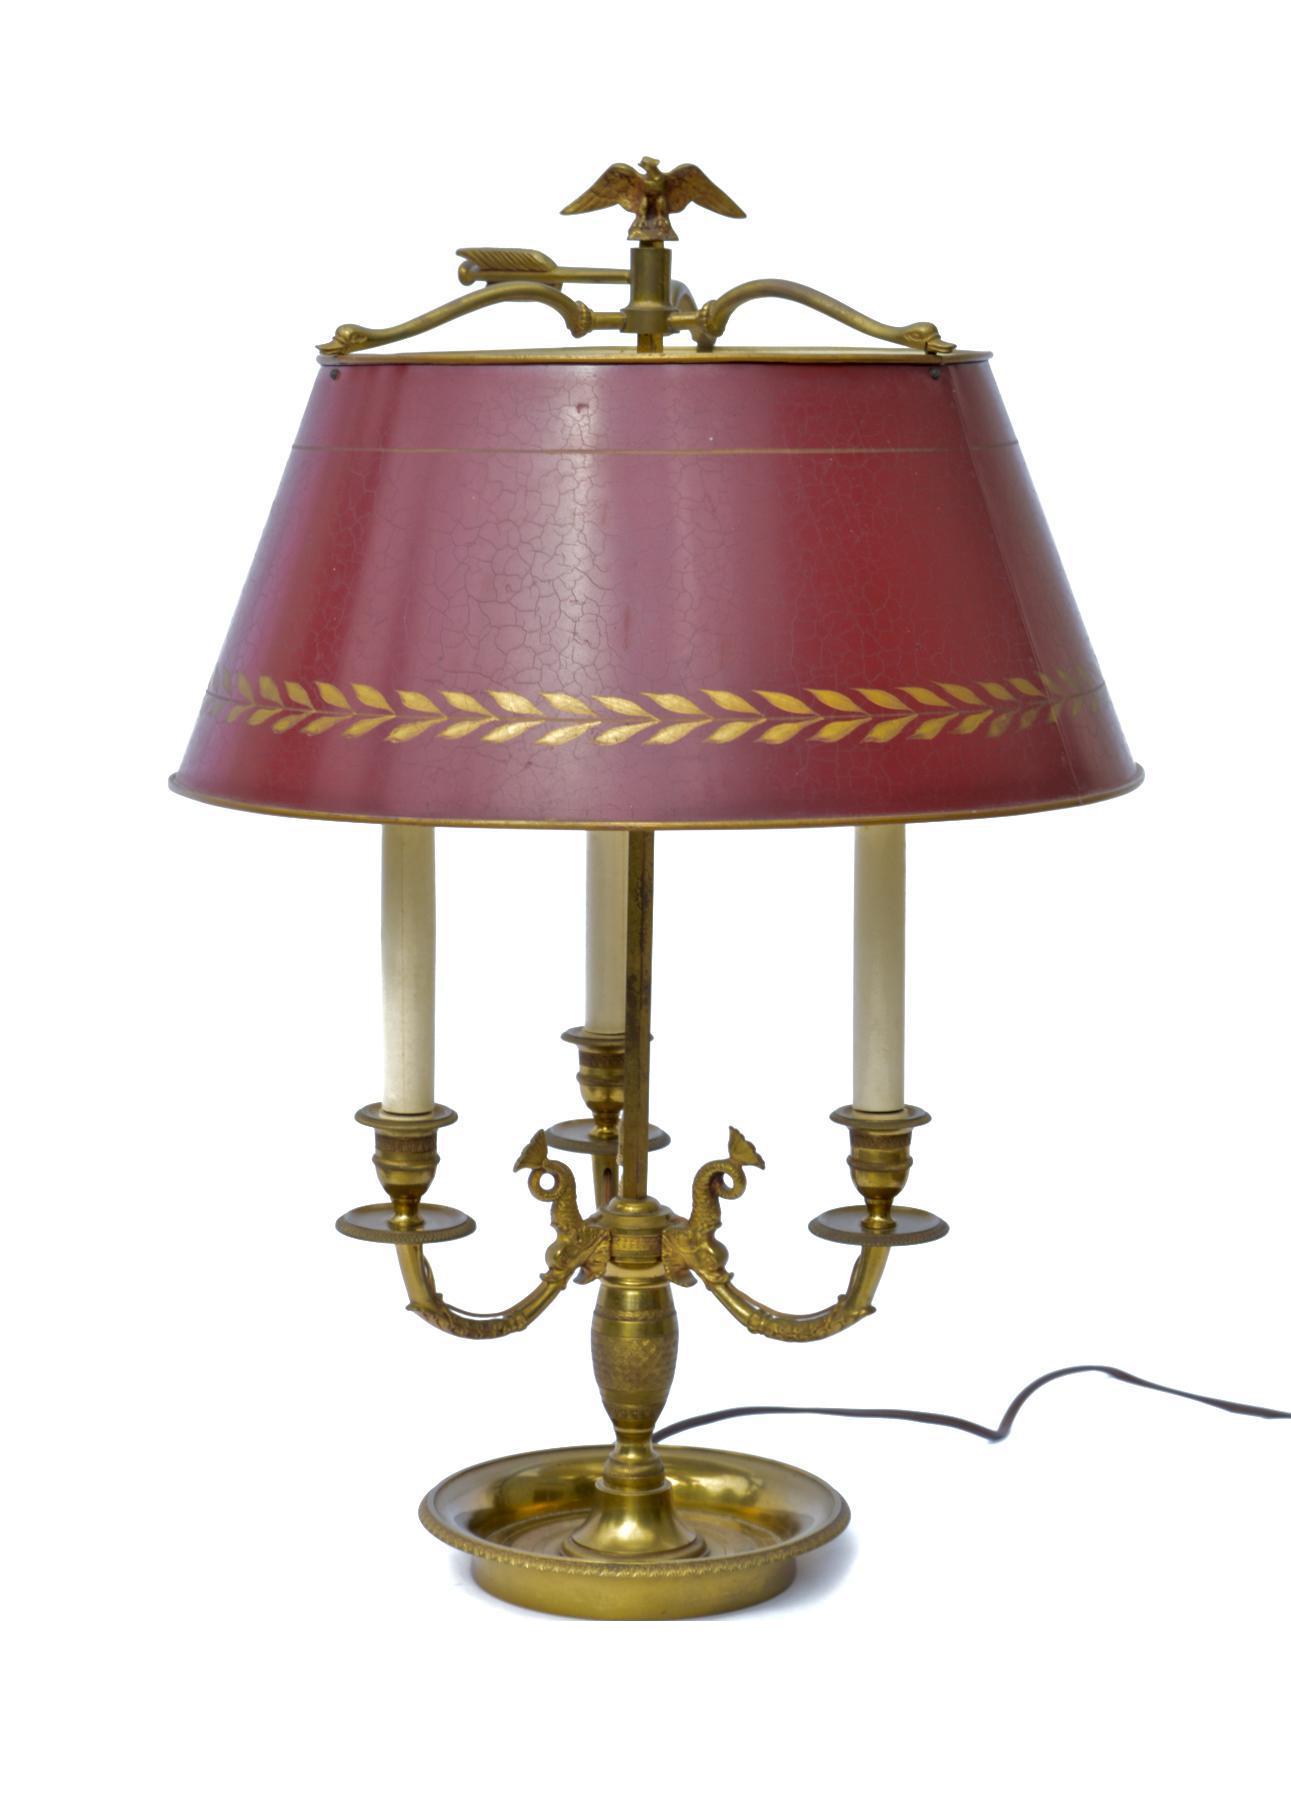 French Empire Bouillotte Lamp